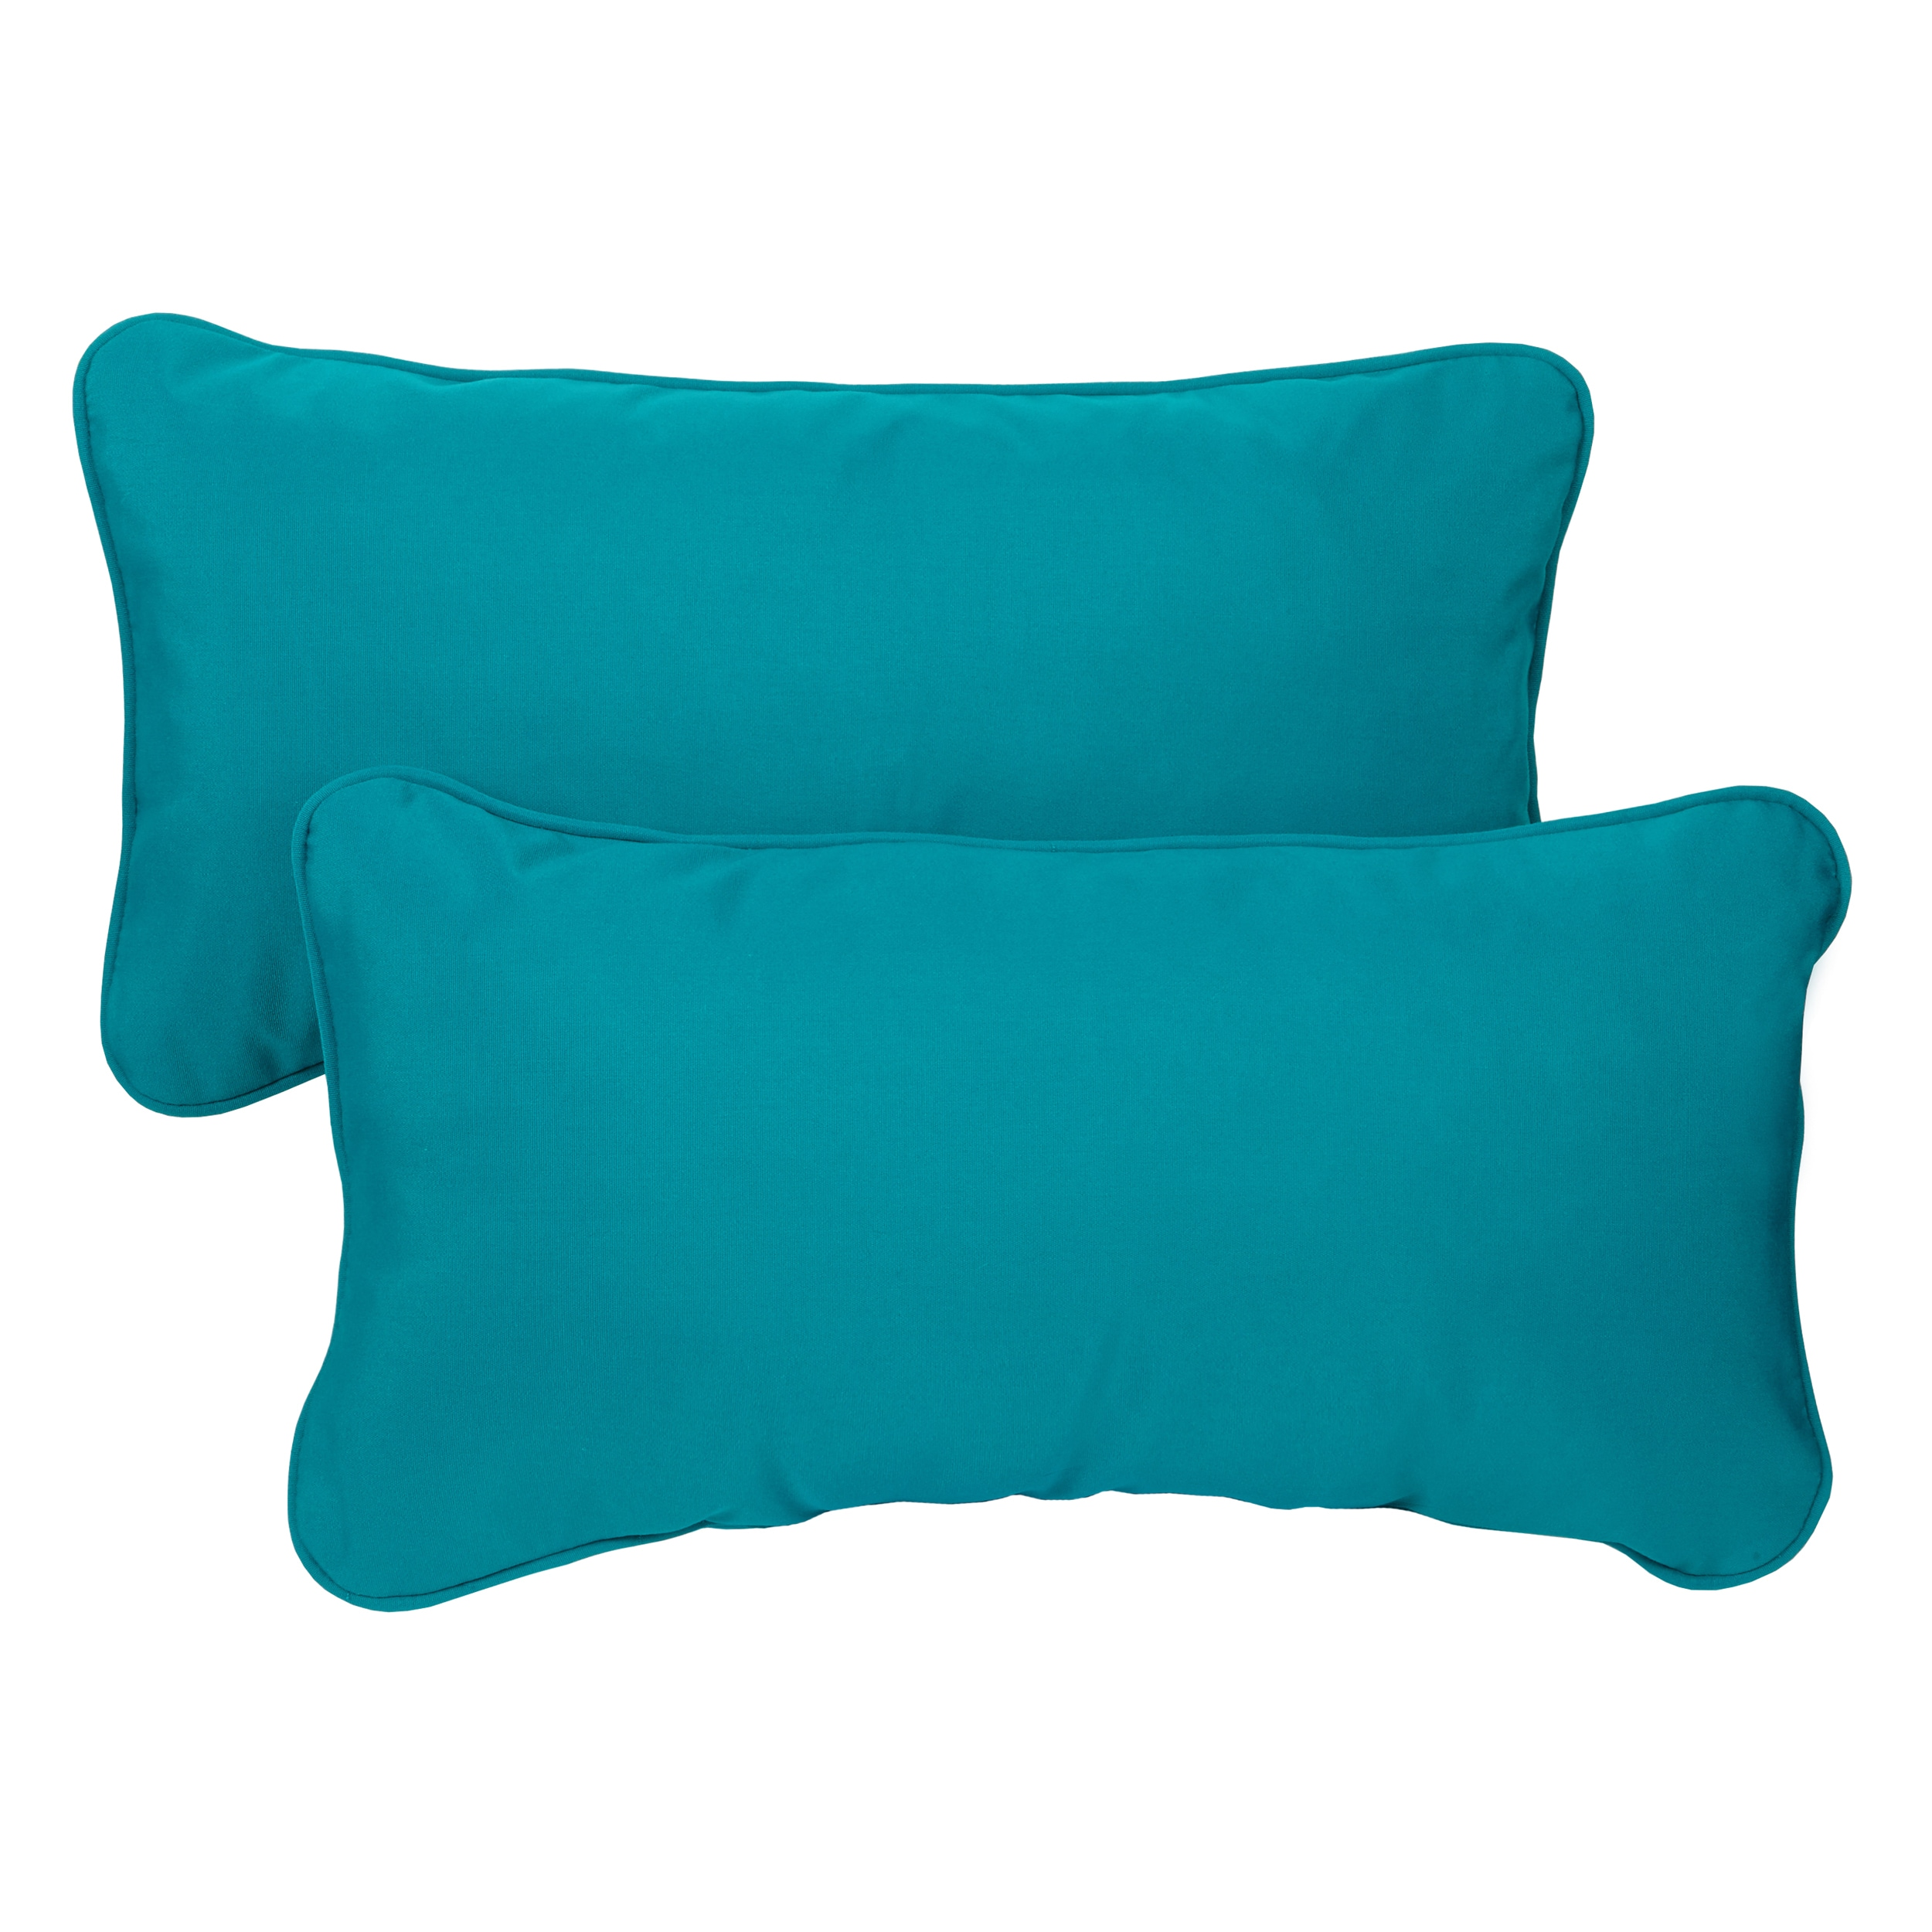 pdp mills lumbar indoor andover indooroutdoor decor claflin pillows pillow outdoor